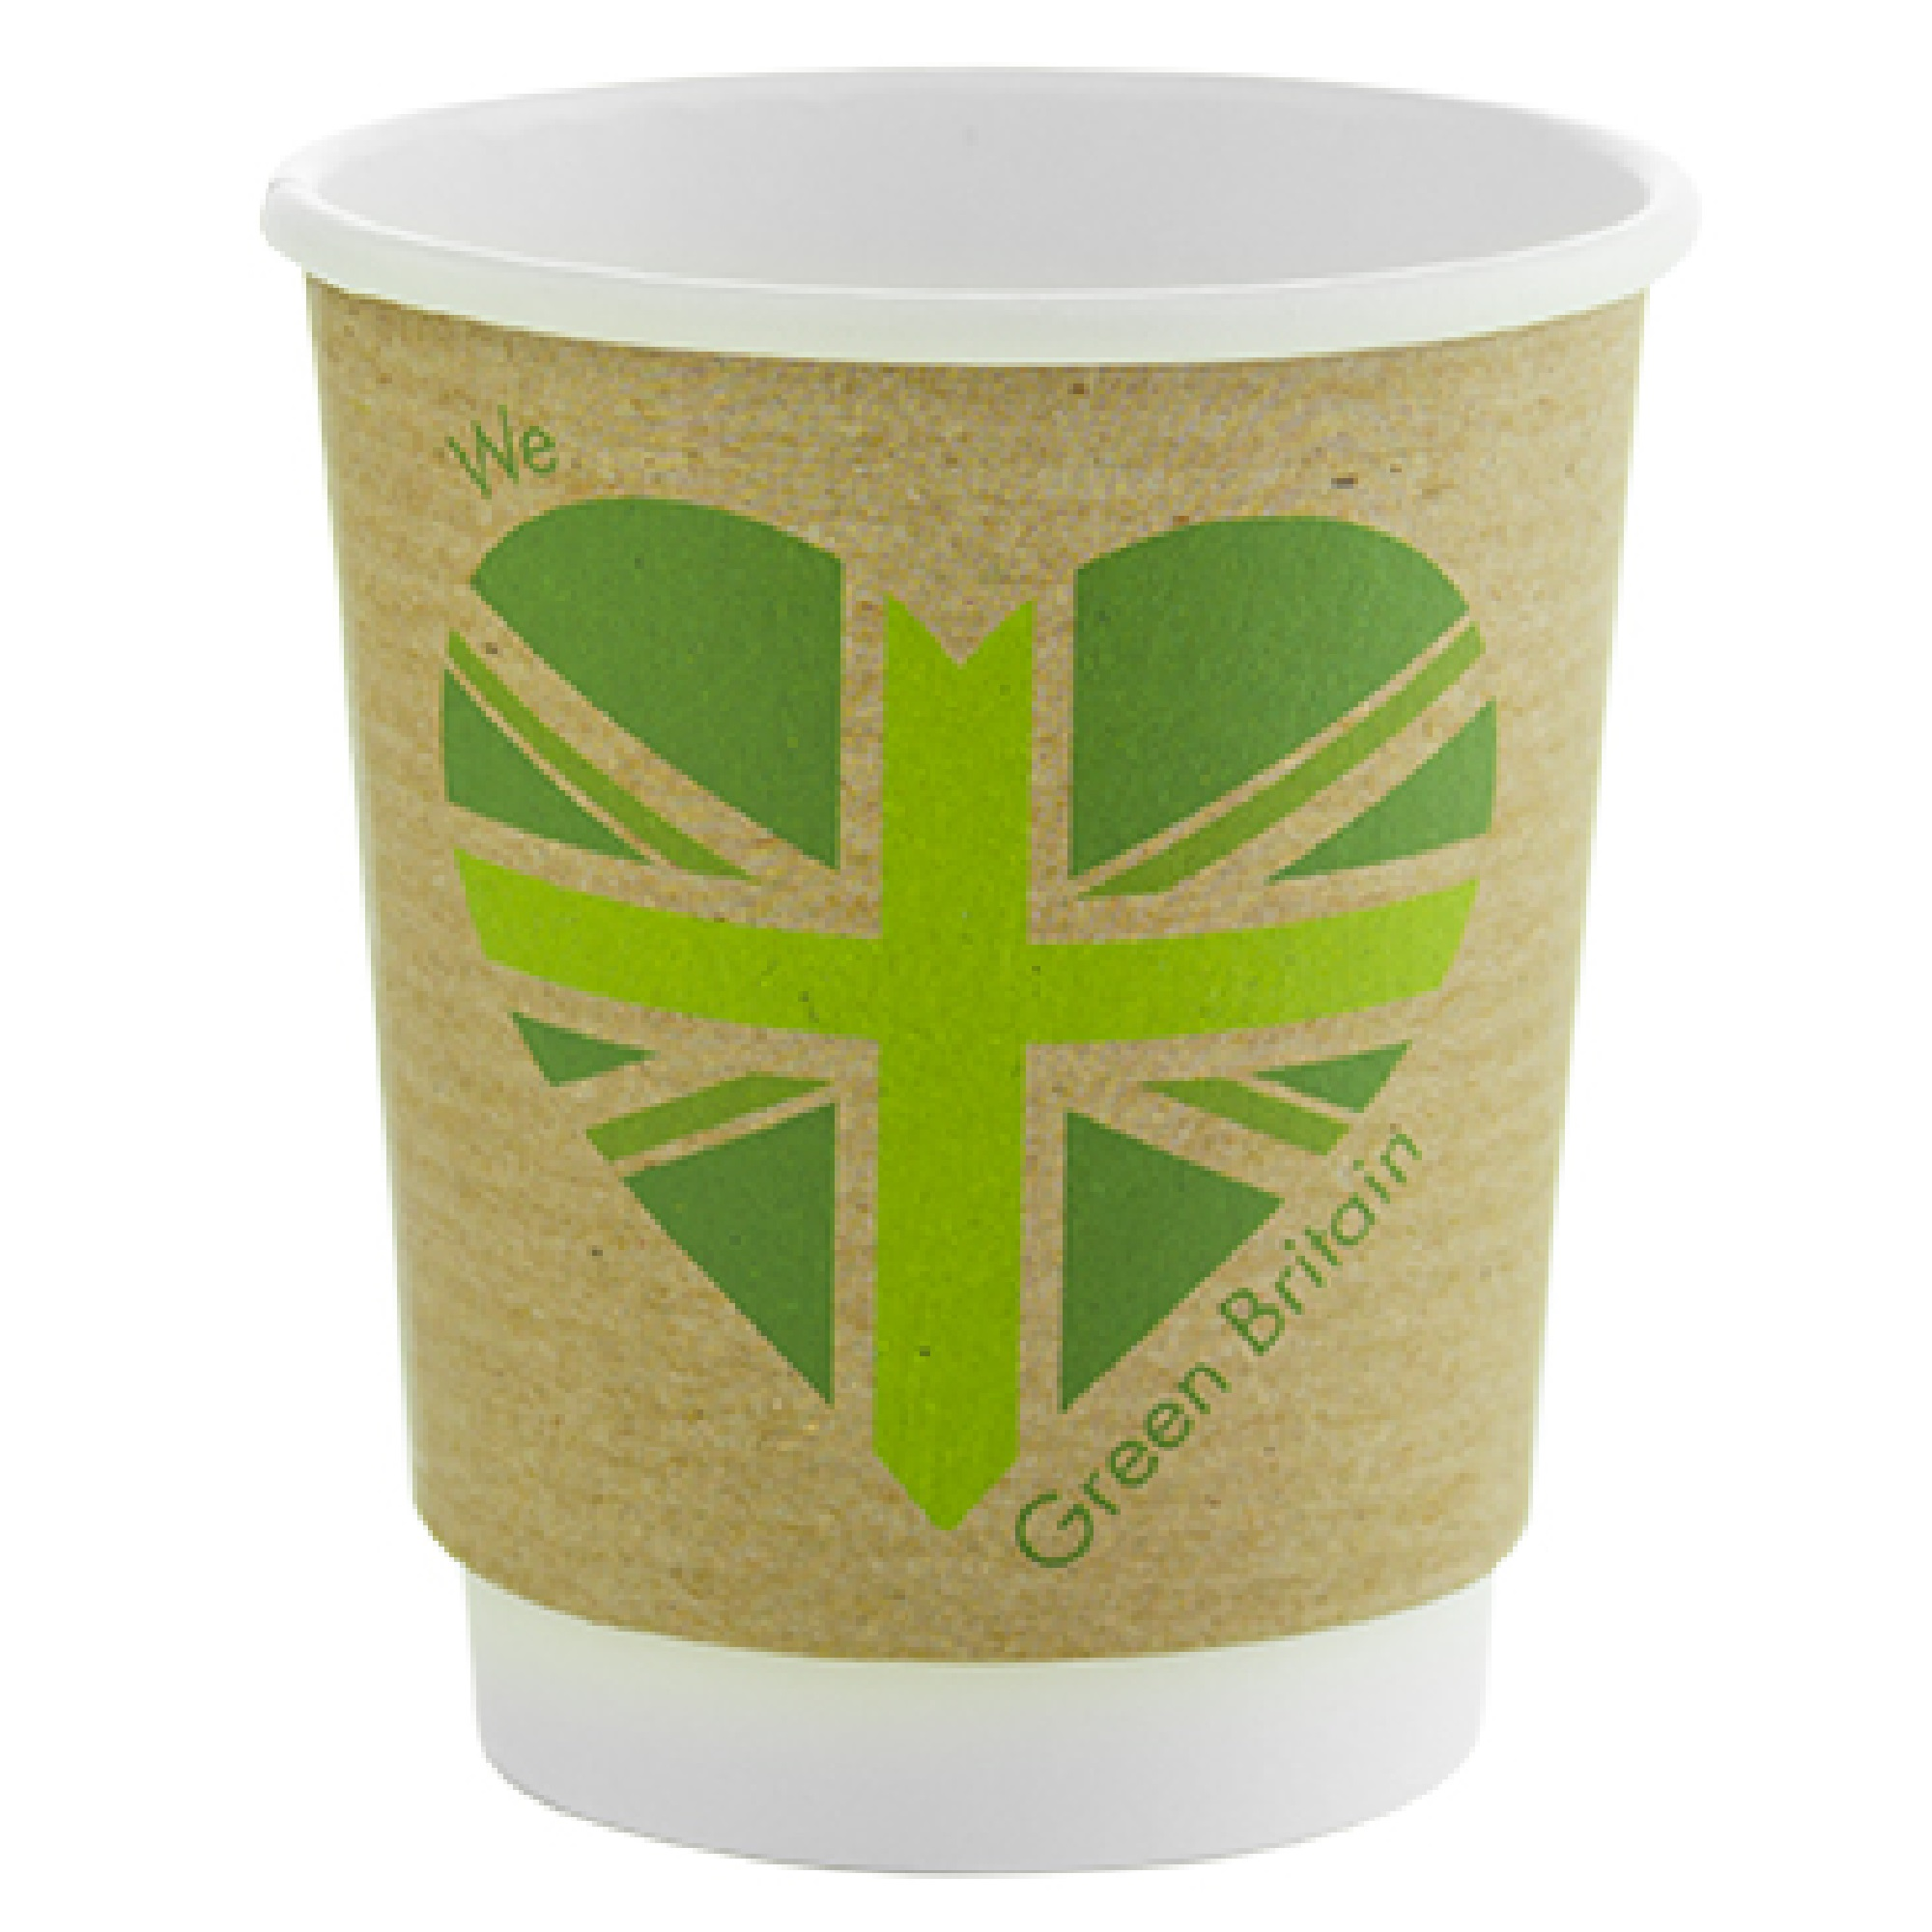 Compostable Coffee Cups | UK | Printed | Cup Lids | Takeaway